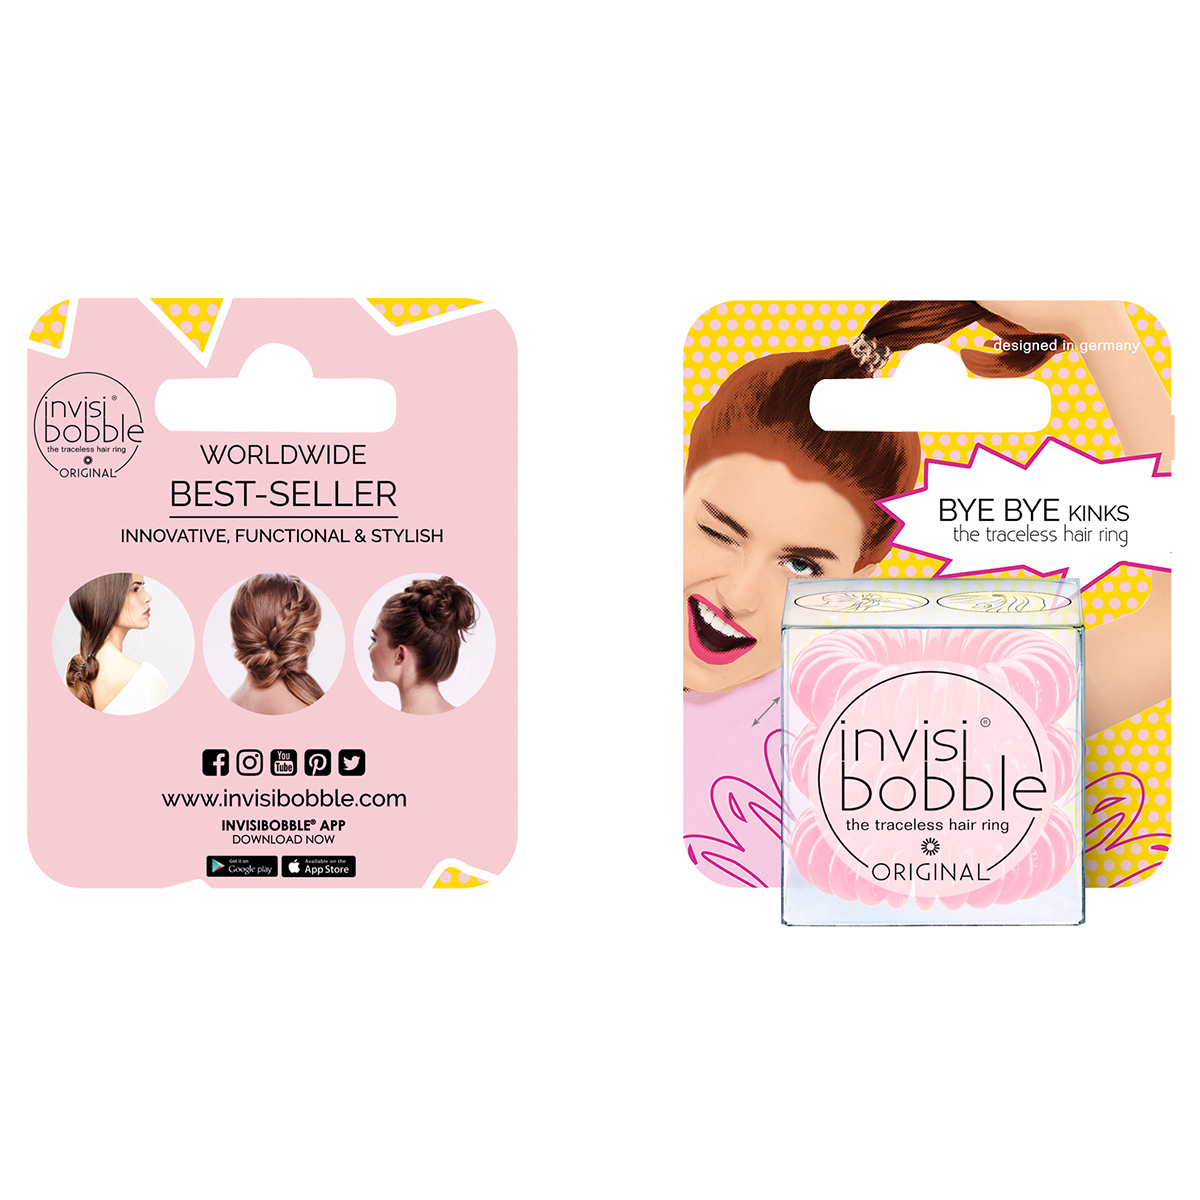 c81fd670a1a9 Резинка-браслет для волос invisibobble ORIGINAL Blush Hour (с ...